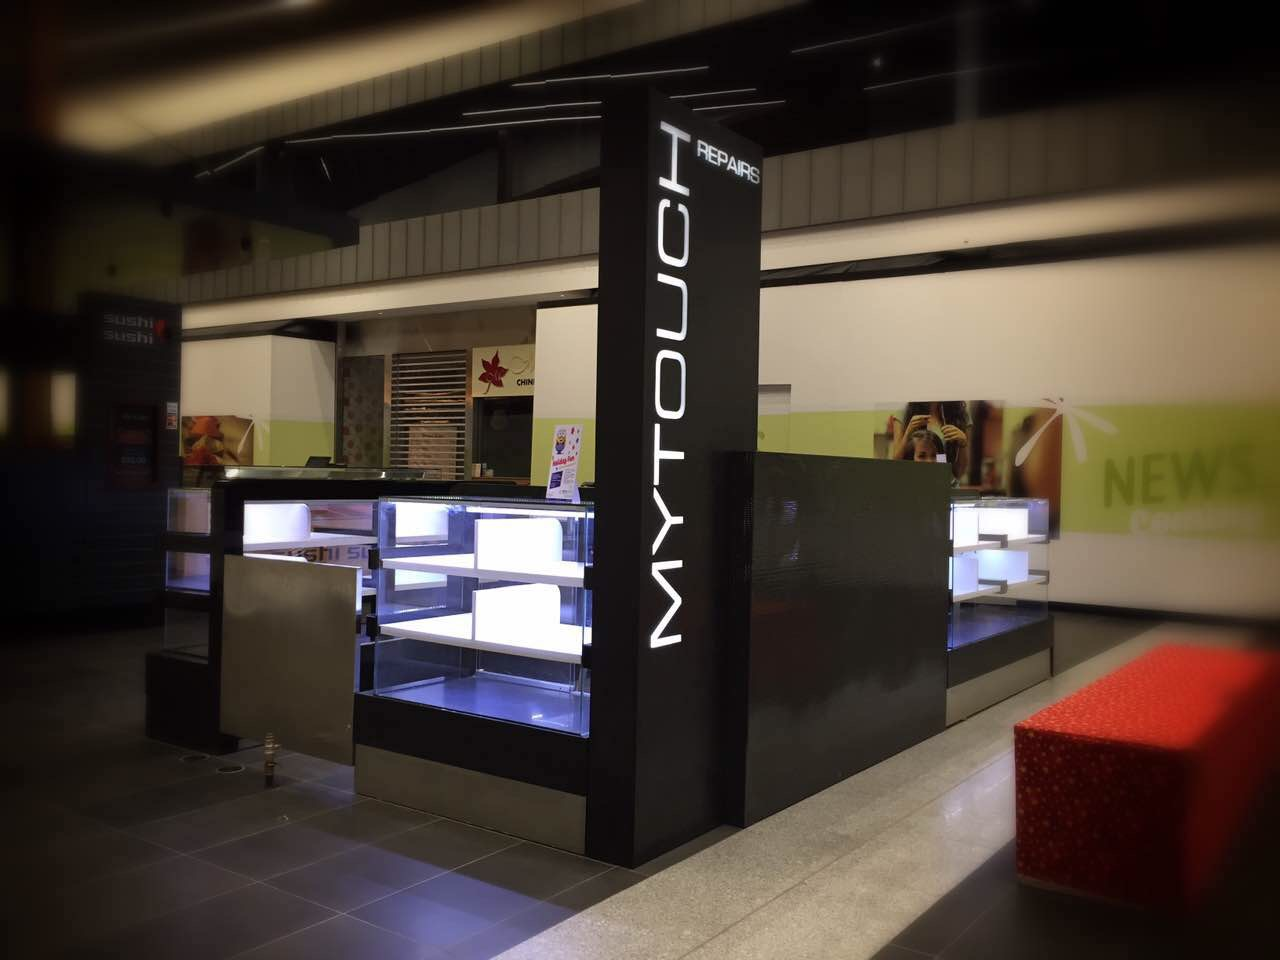 MYTOUCH REPAIRS Phone Kiosk